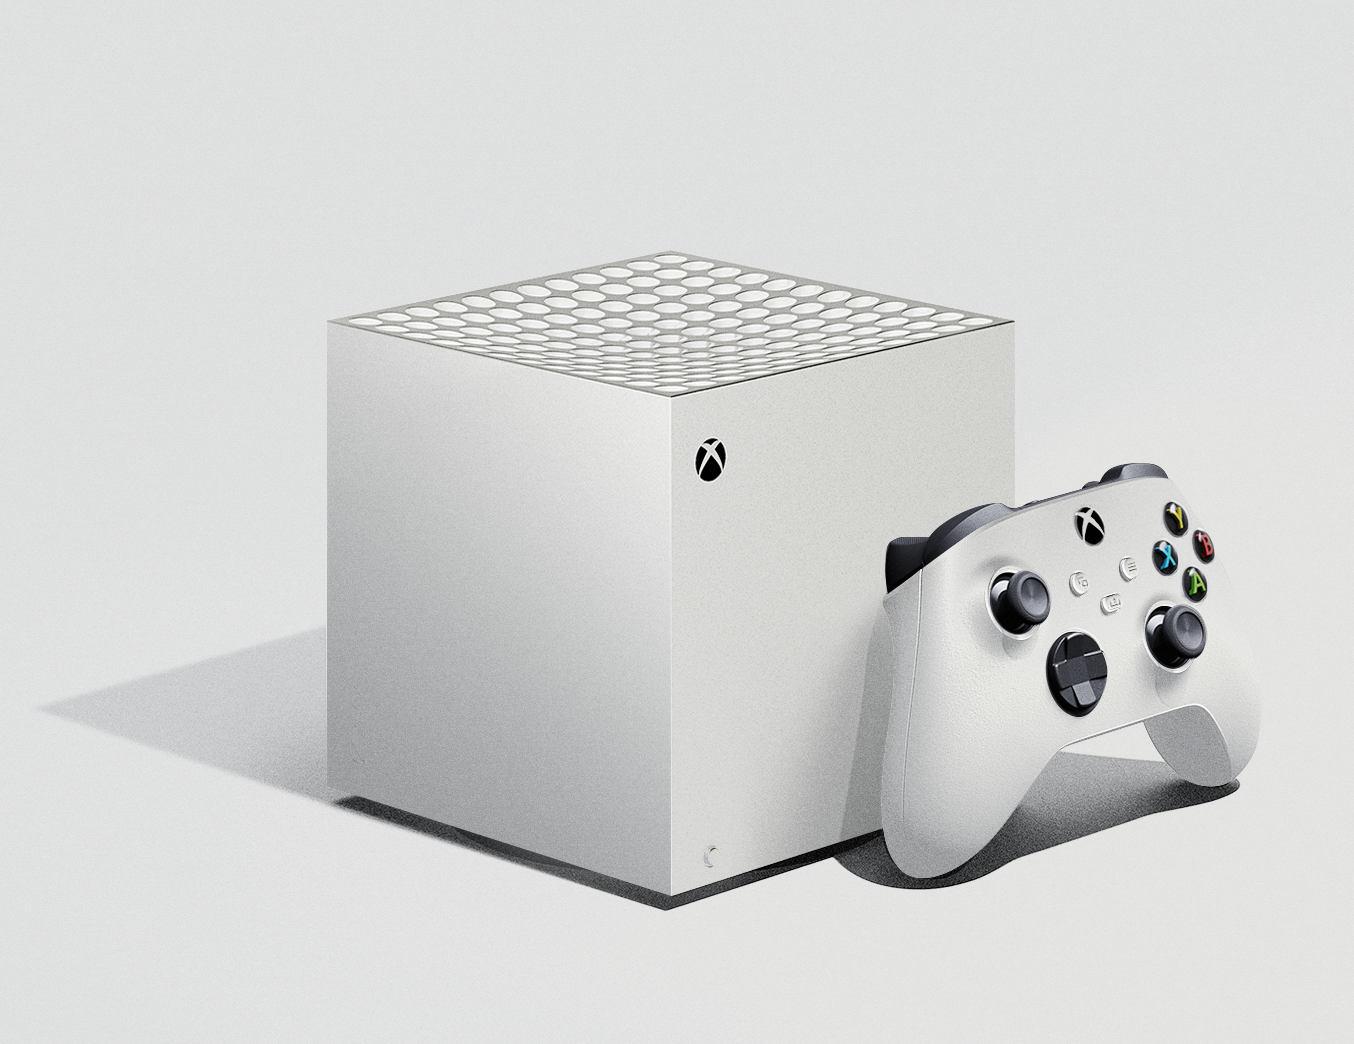 Xbox Series Xに廉価モデルの噂、5月上旬に発表される